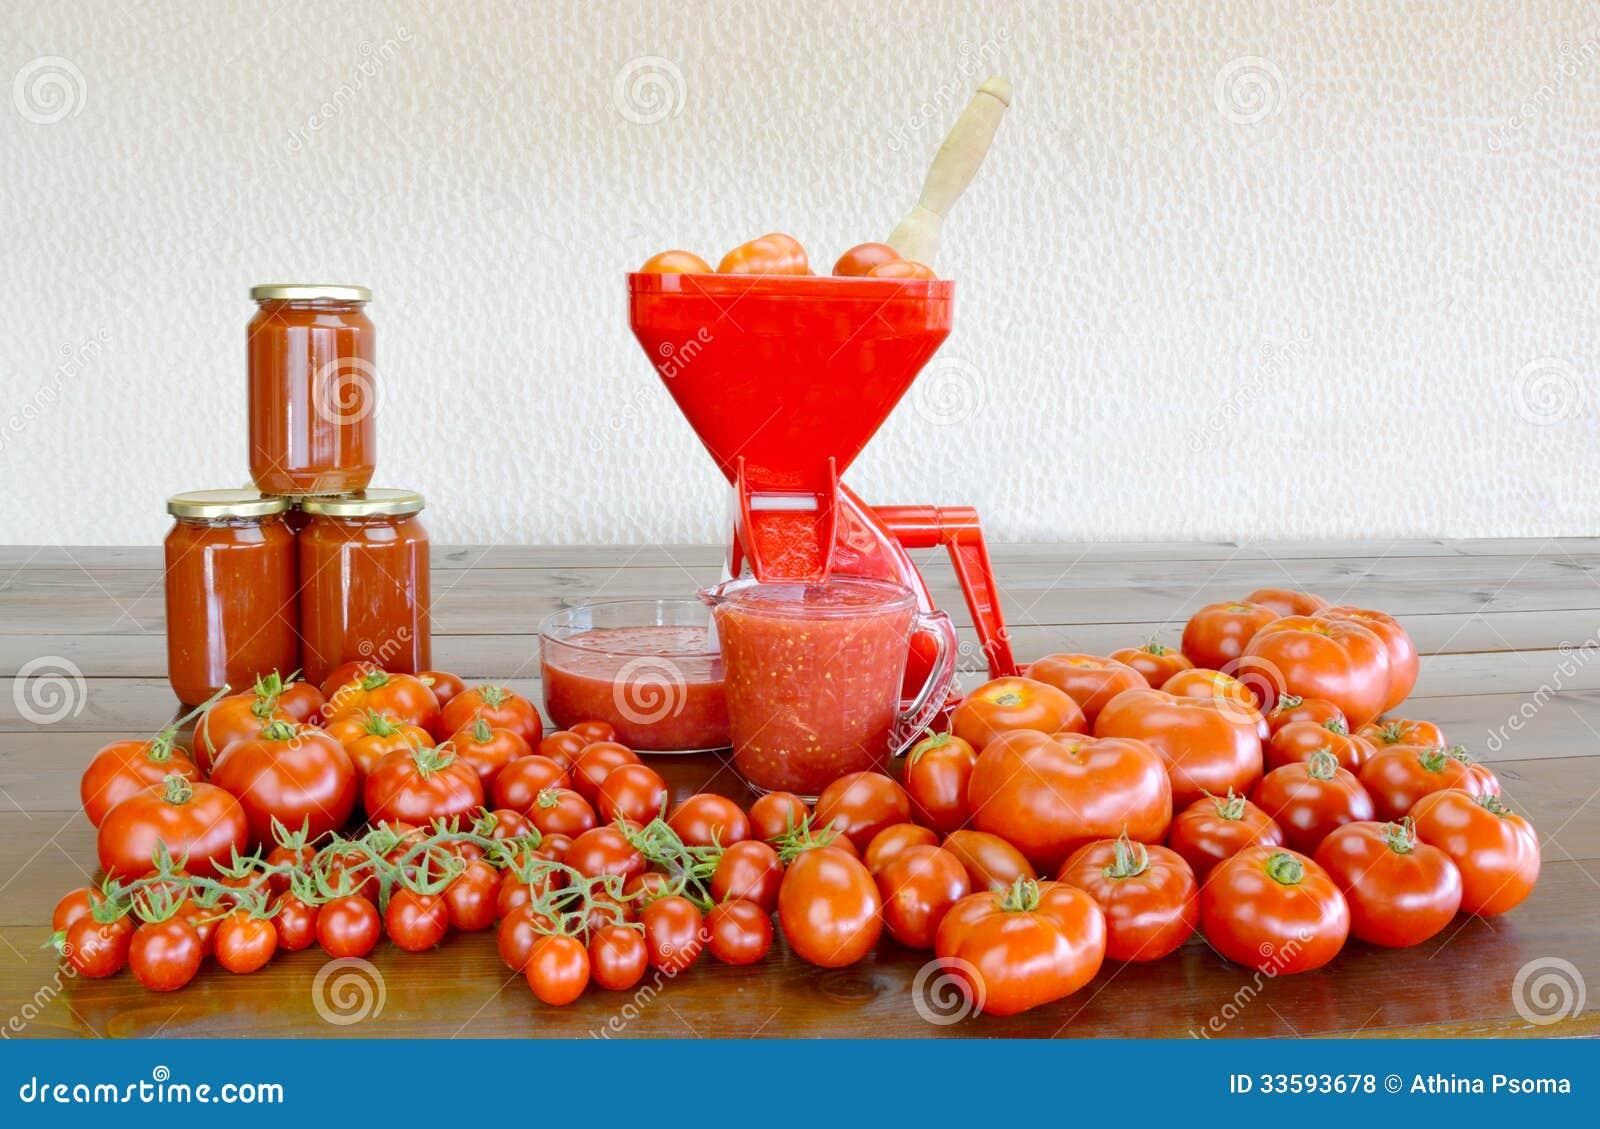 Making Homemade Tomato Sauce Royalty Free Stock Photos Image 33593678